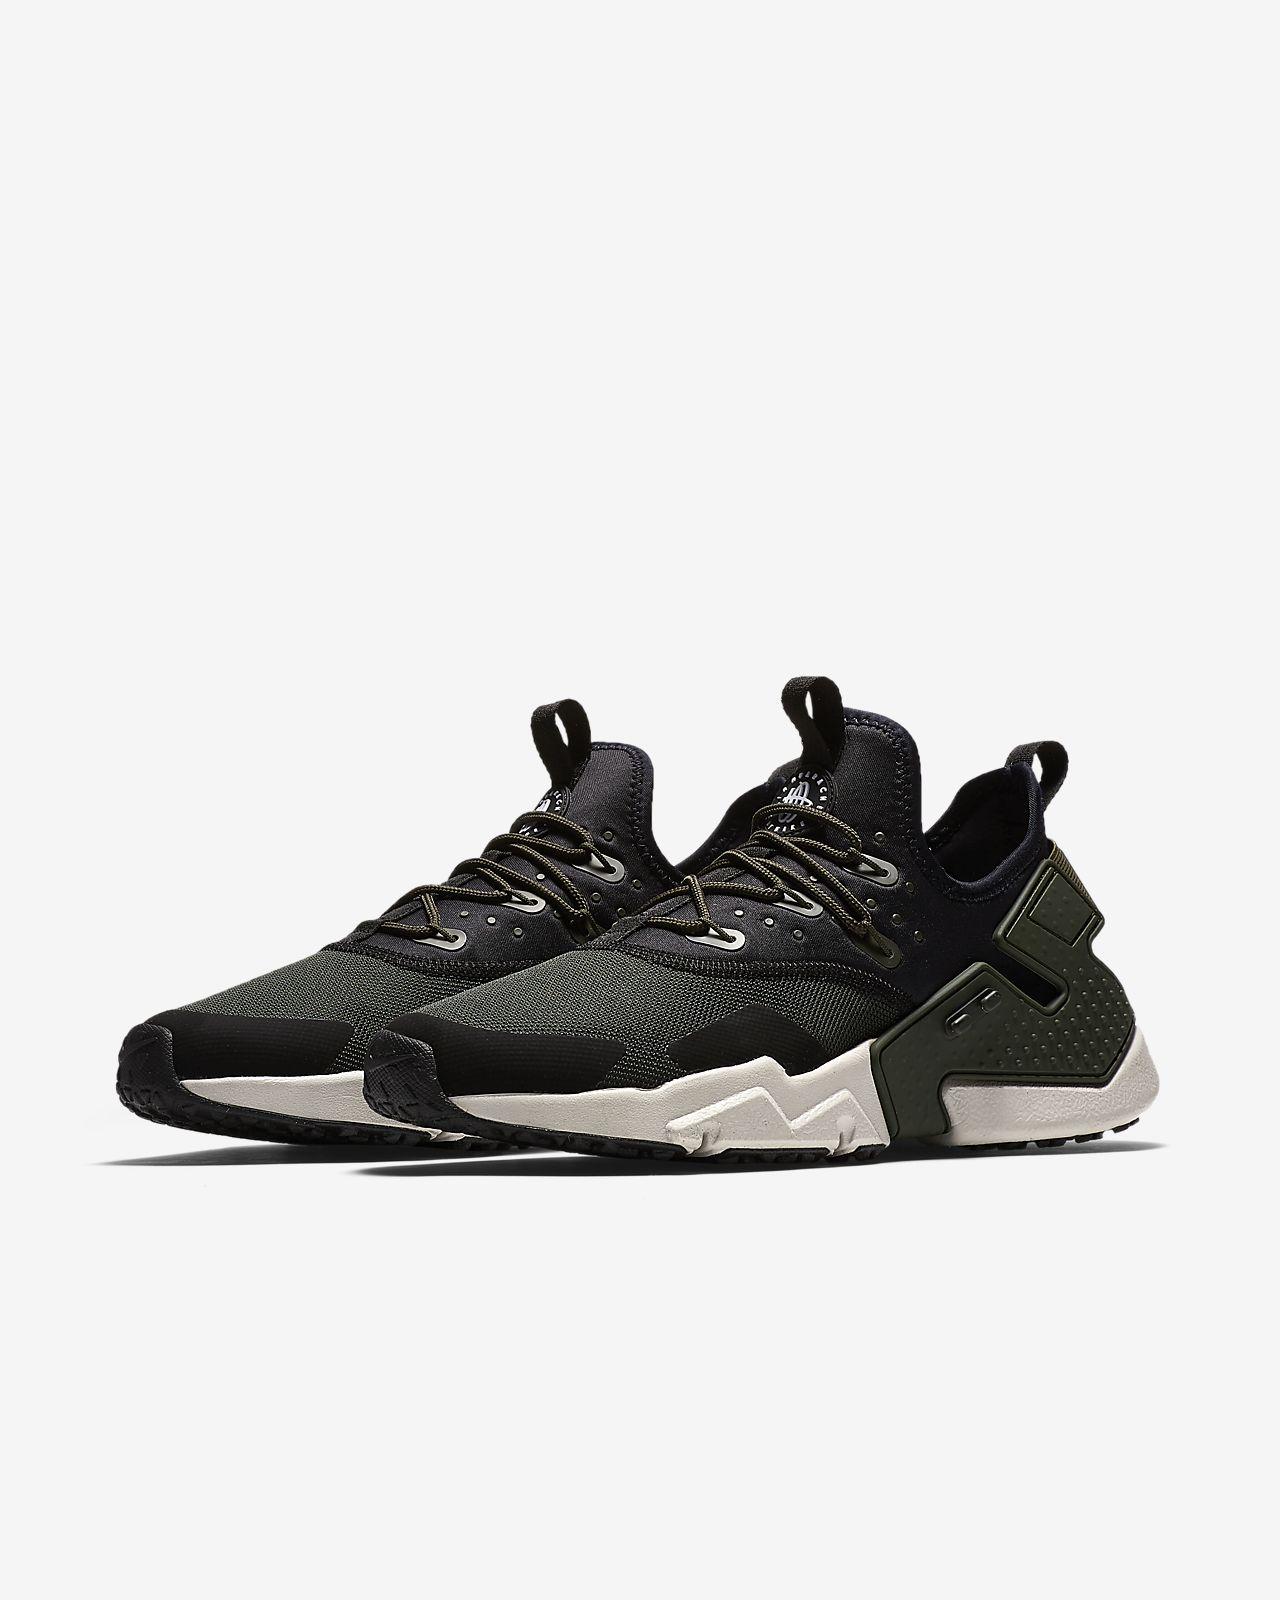 Nike Men's Air Huarache Drift Shoe, Scarpe da Ginnastica Uomo, Nero (Black/White 003), 45 EU